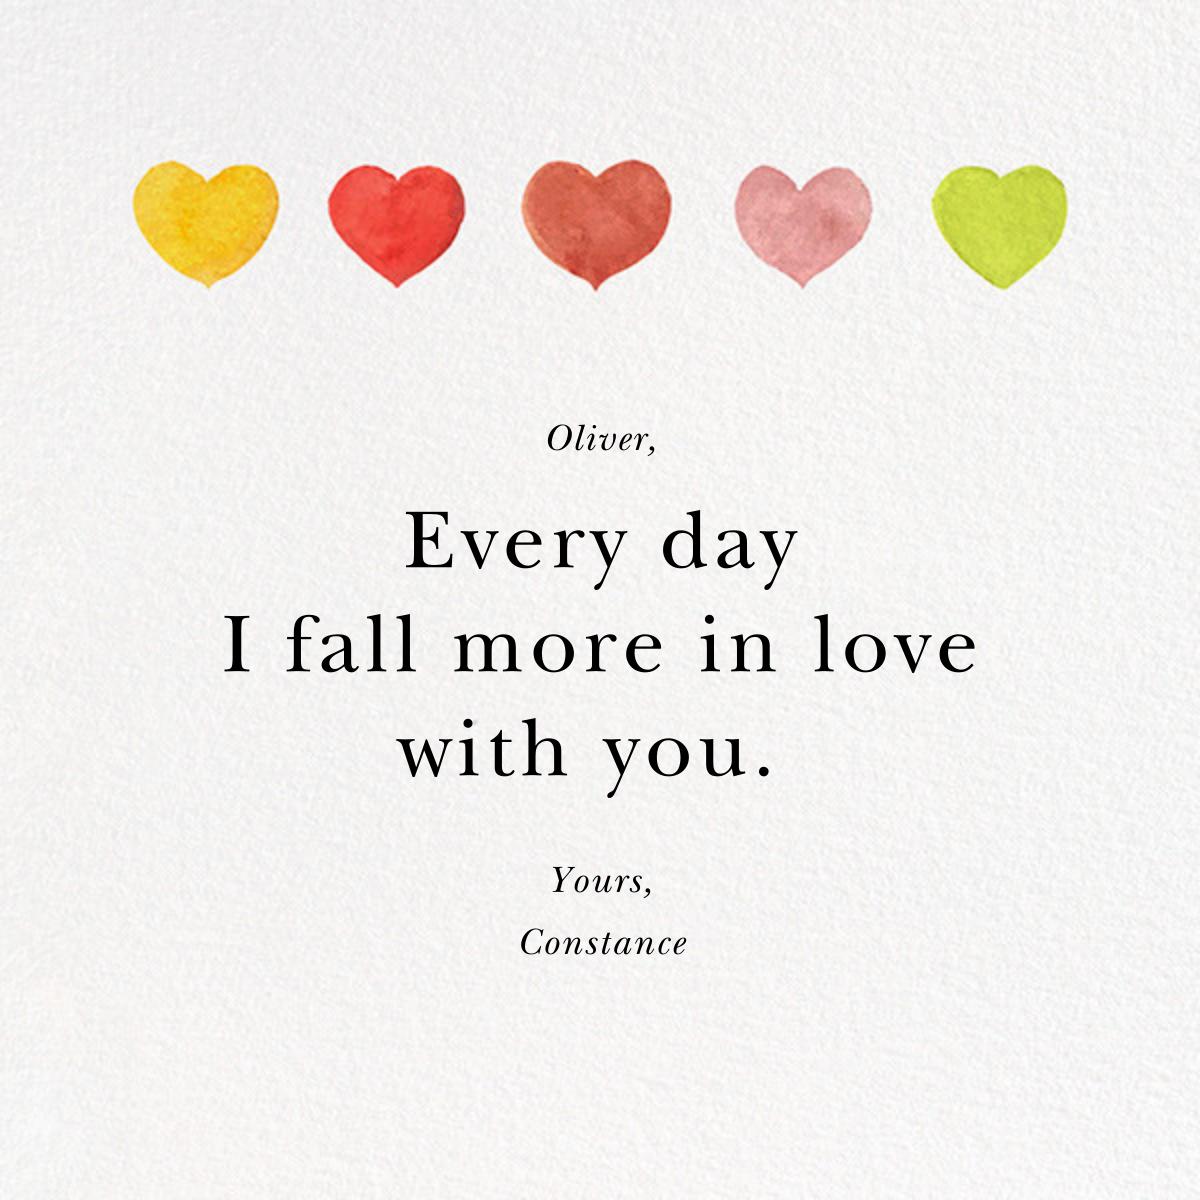 Row of Hearts - Felix Doolittle - Valentine's Day